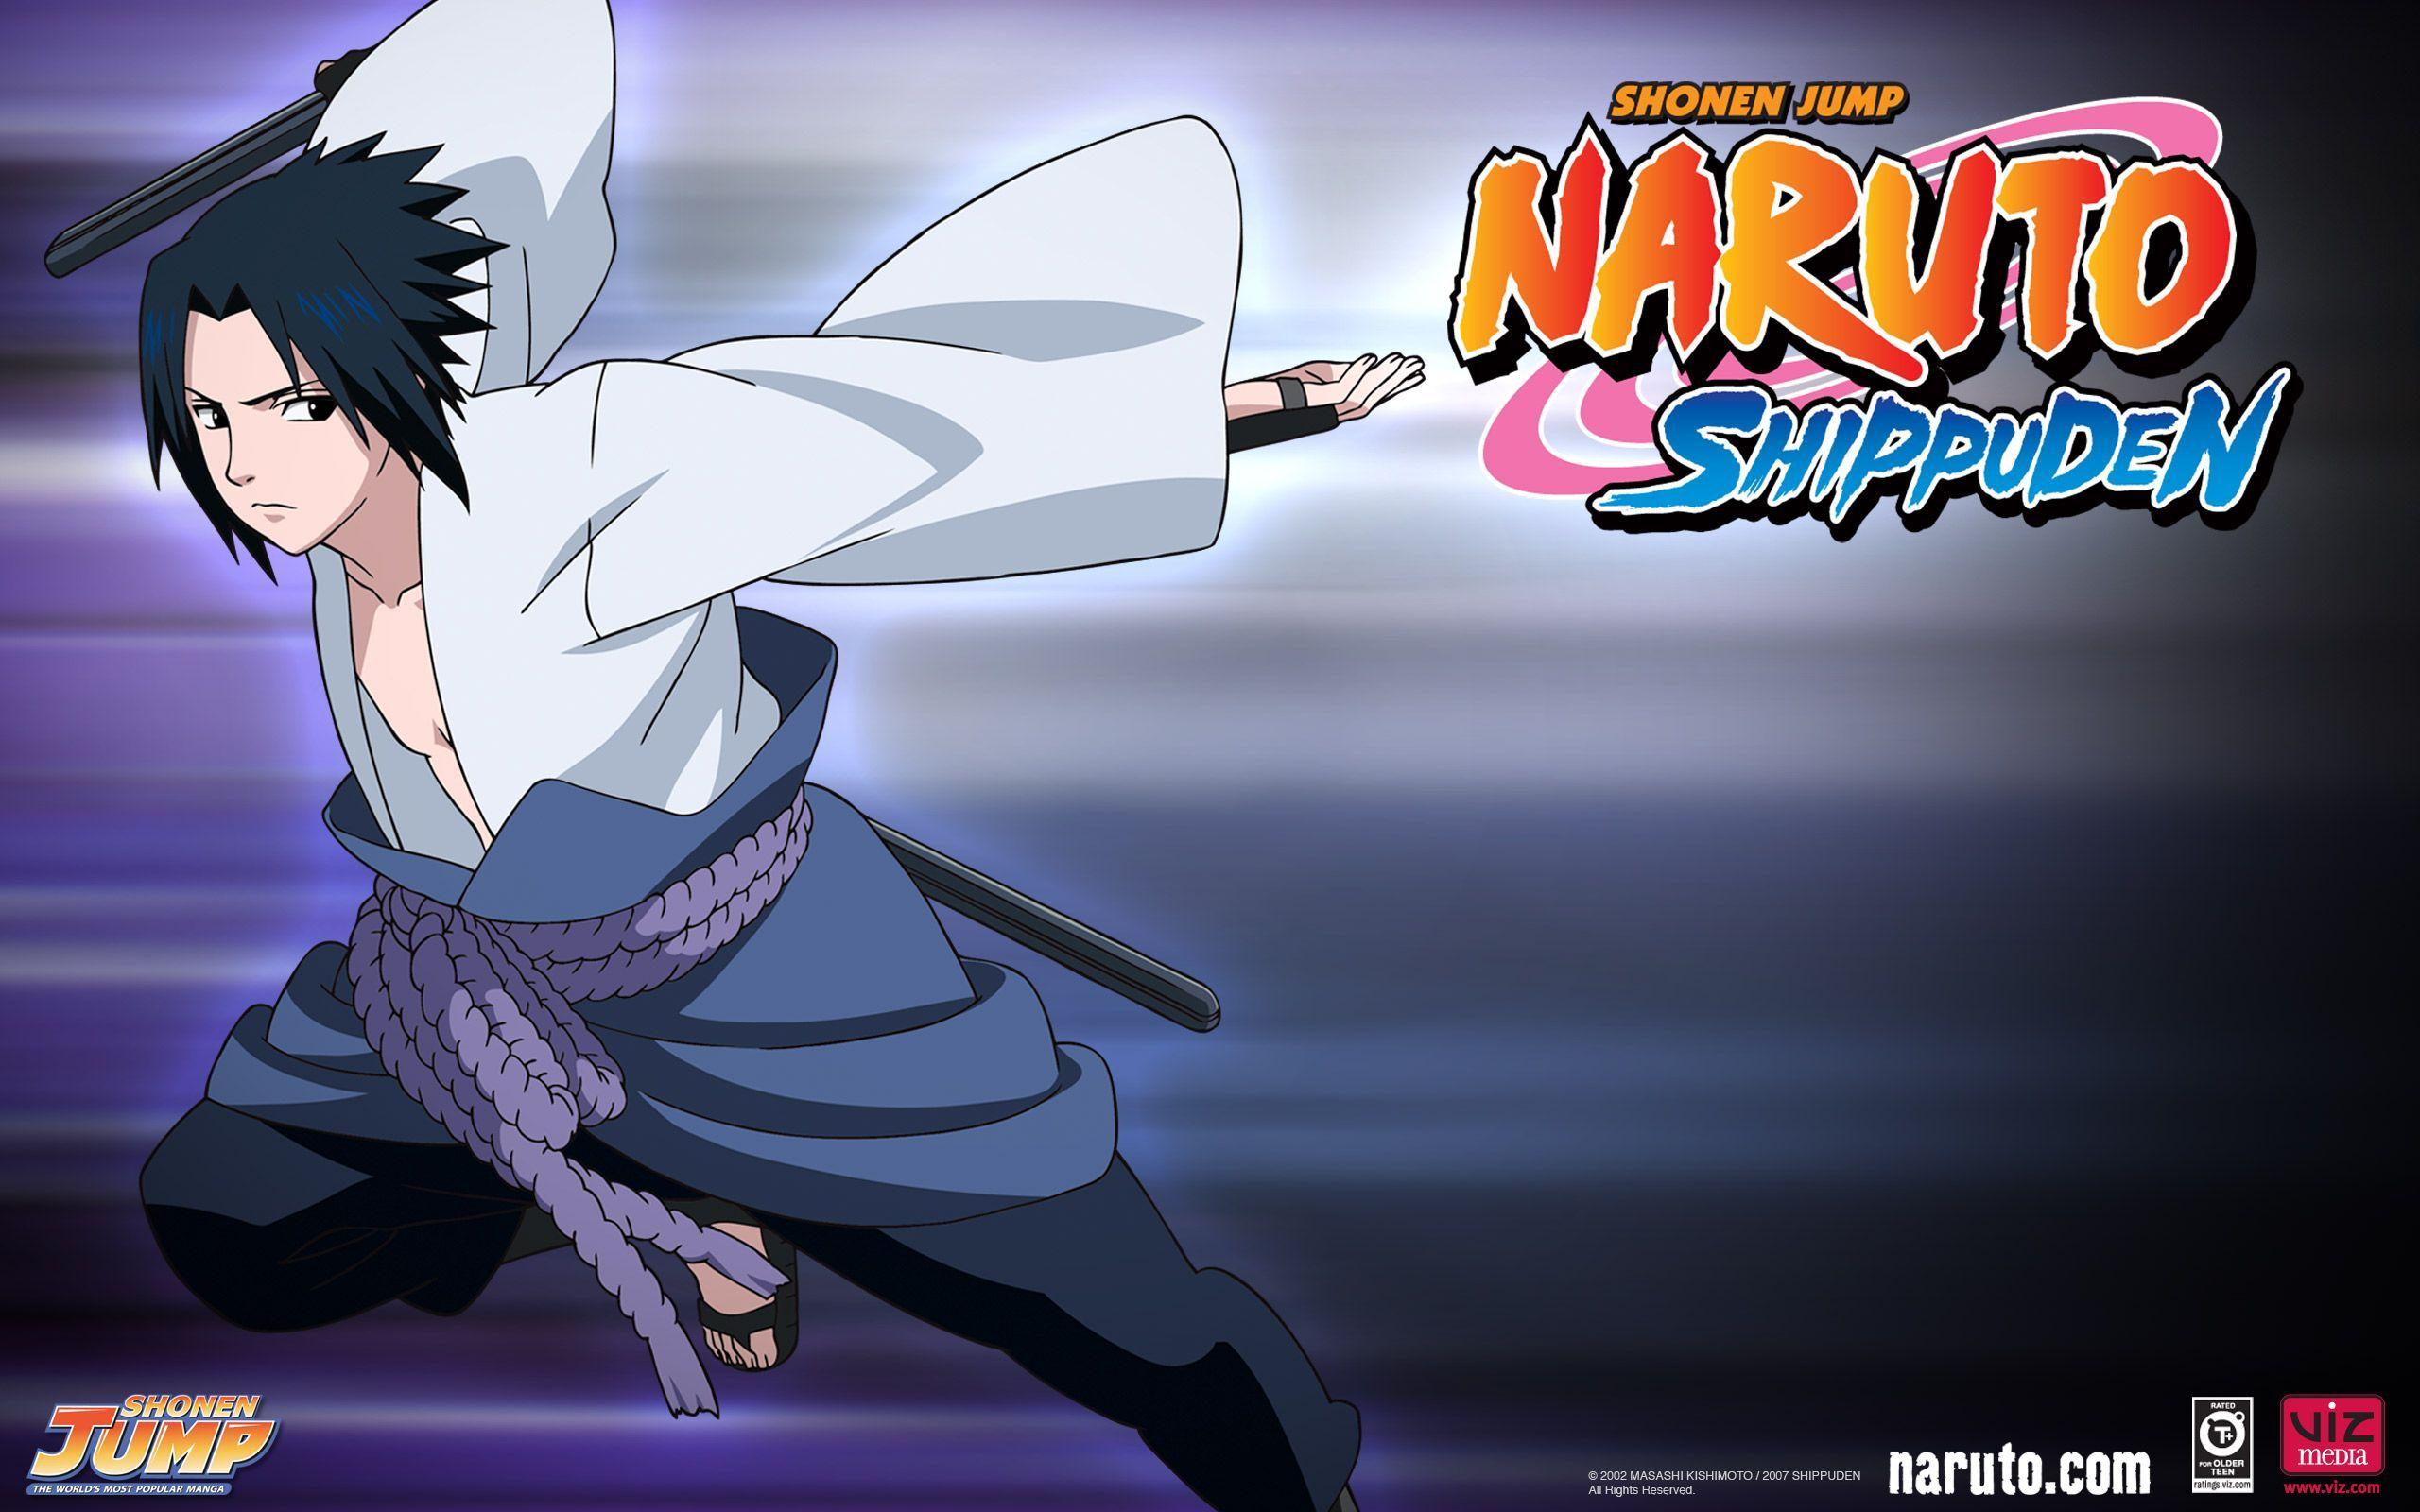 Naruto shippuden episode 252 vf